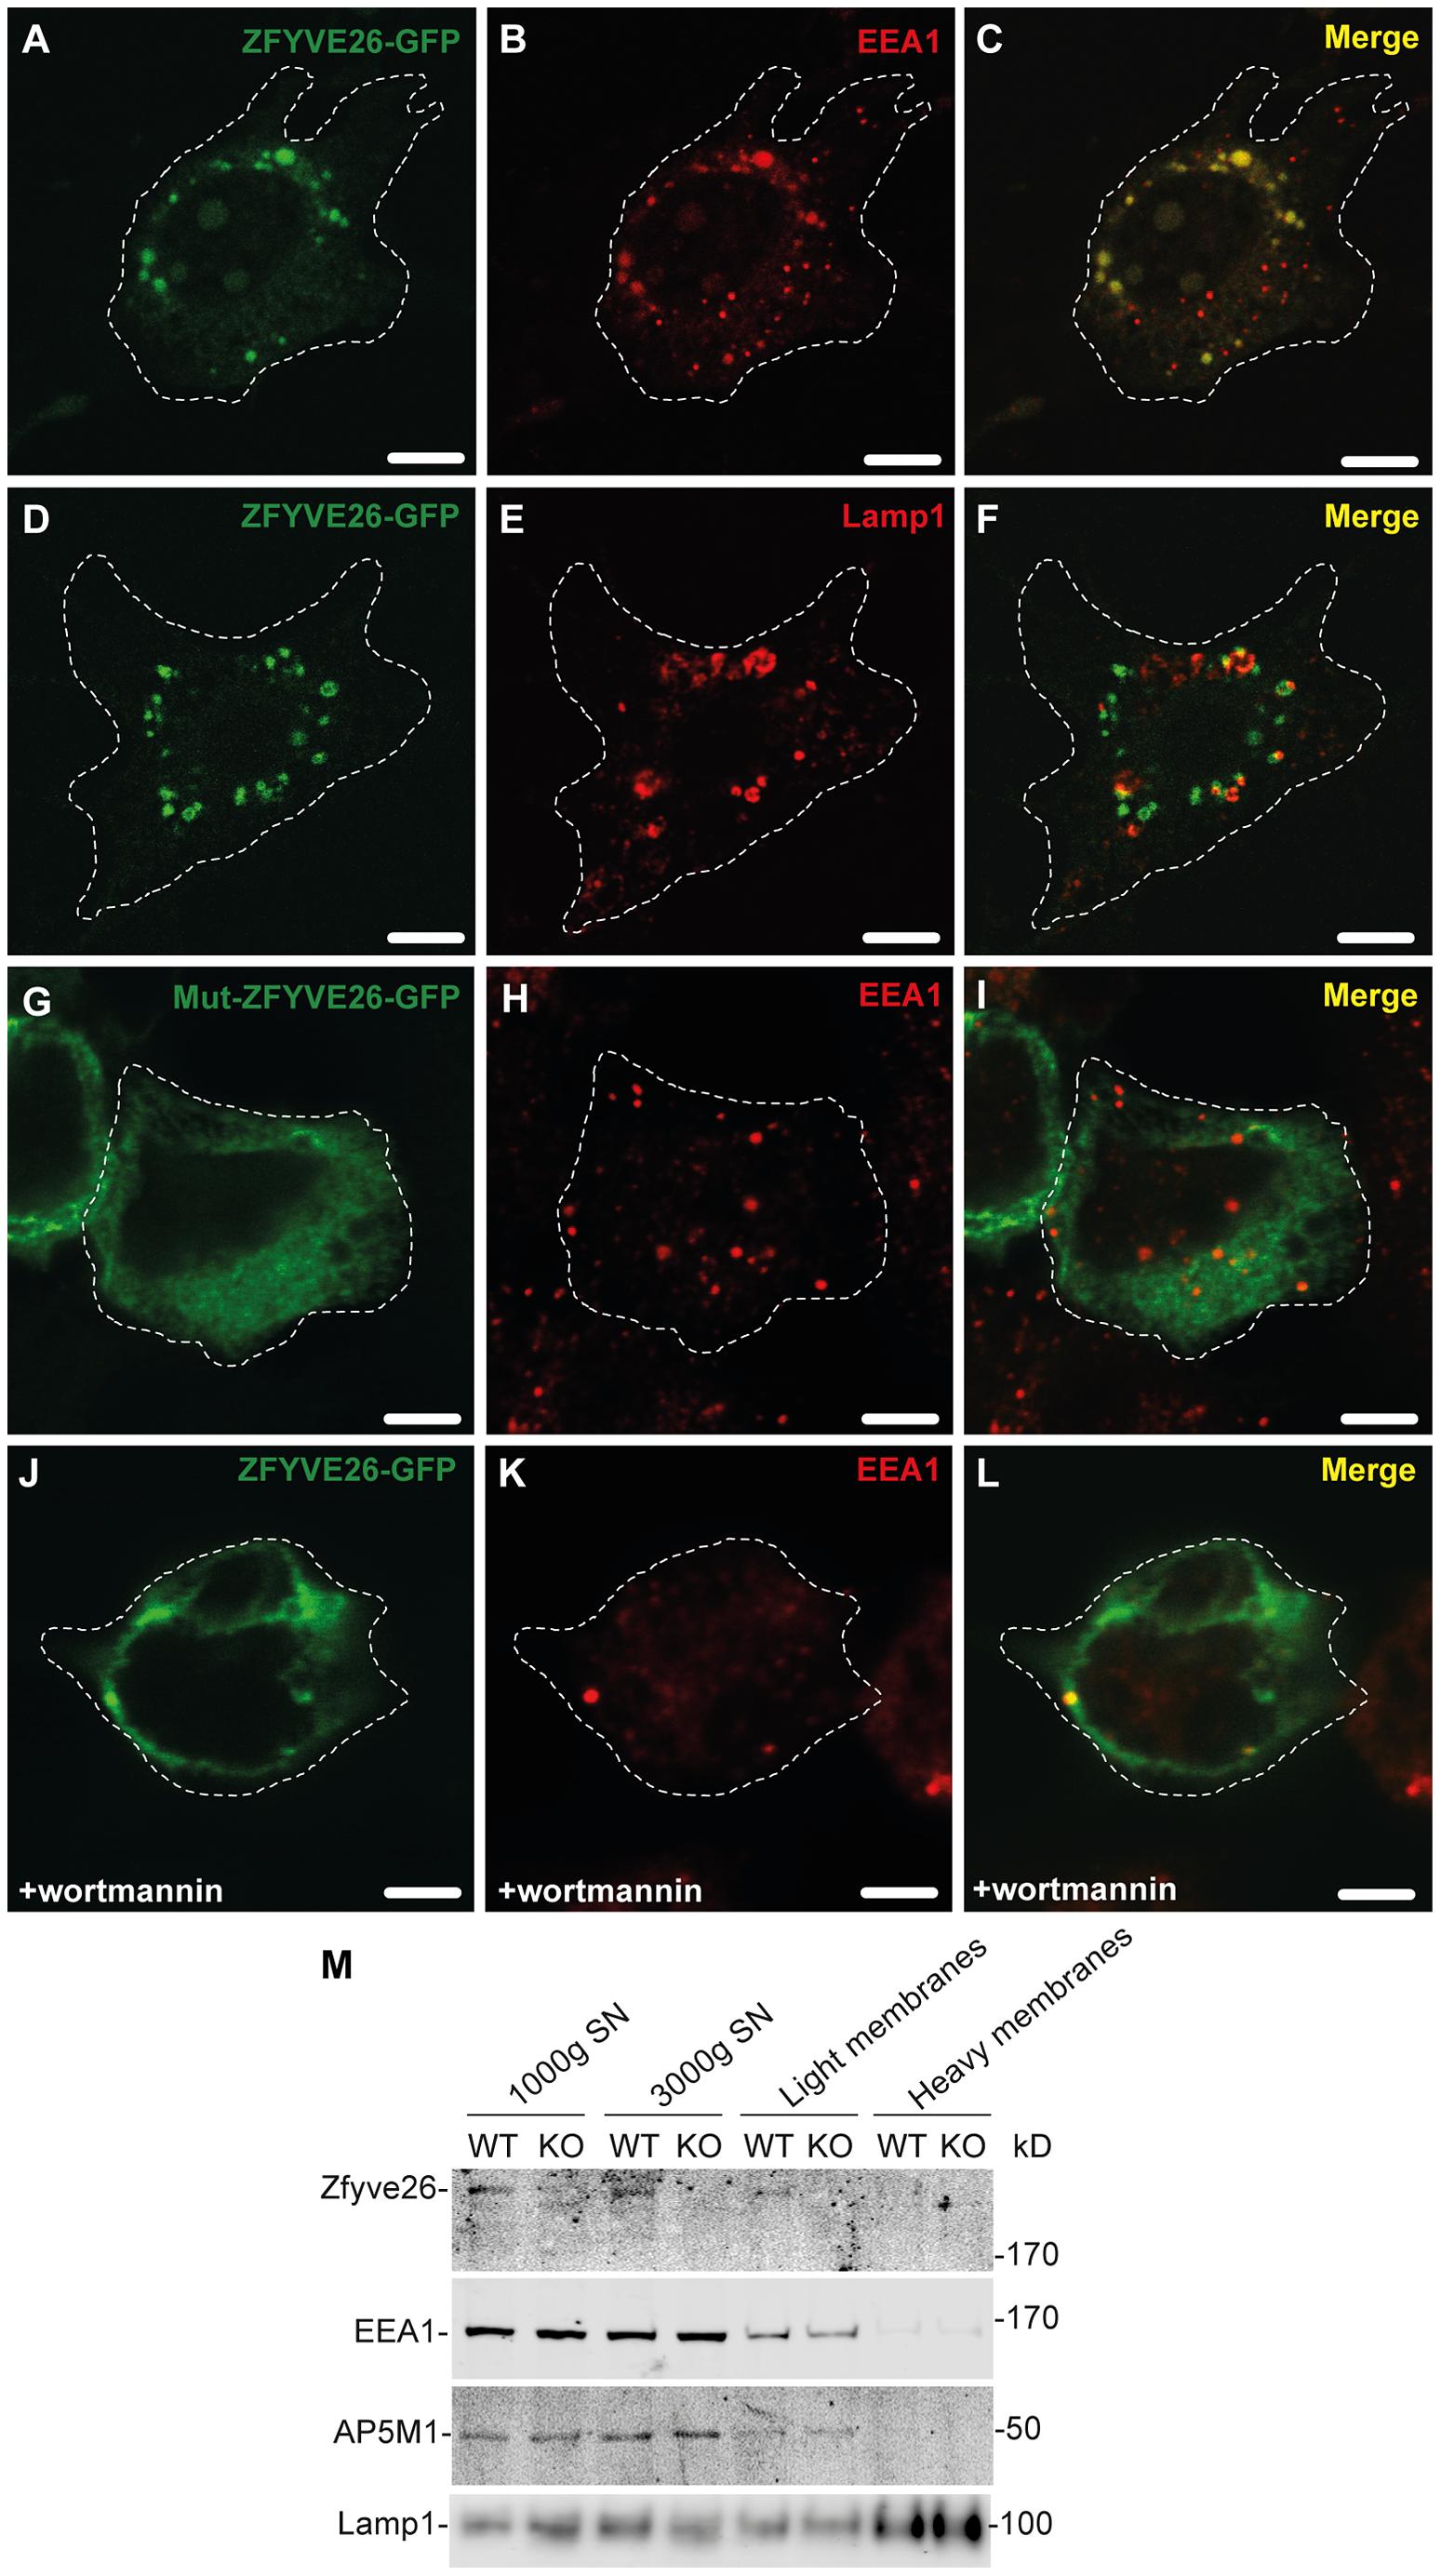 Zfyve26 is associated with endolysosomal membranes.